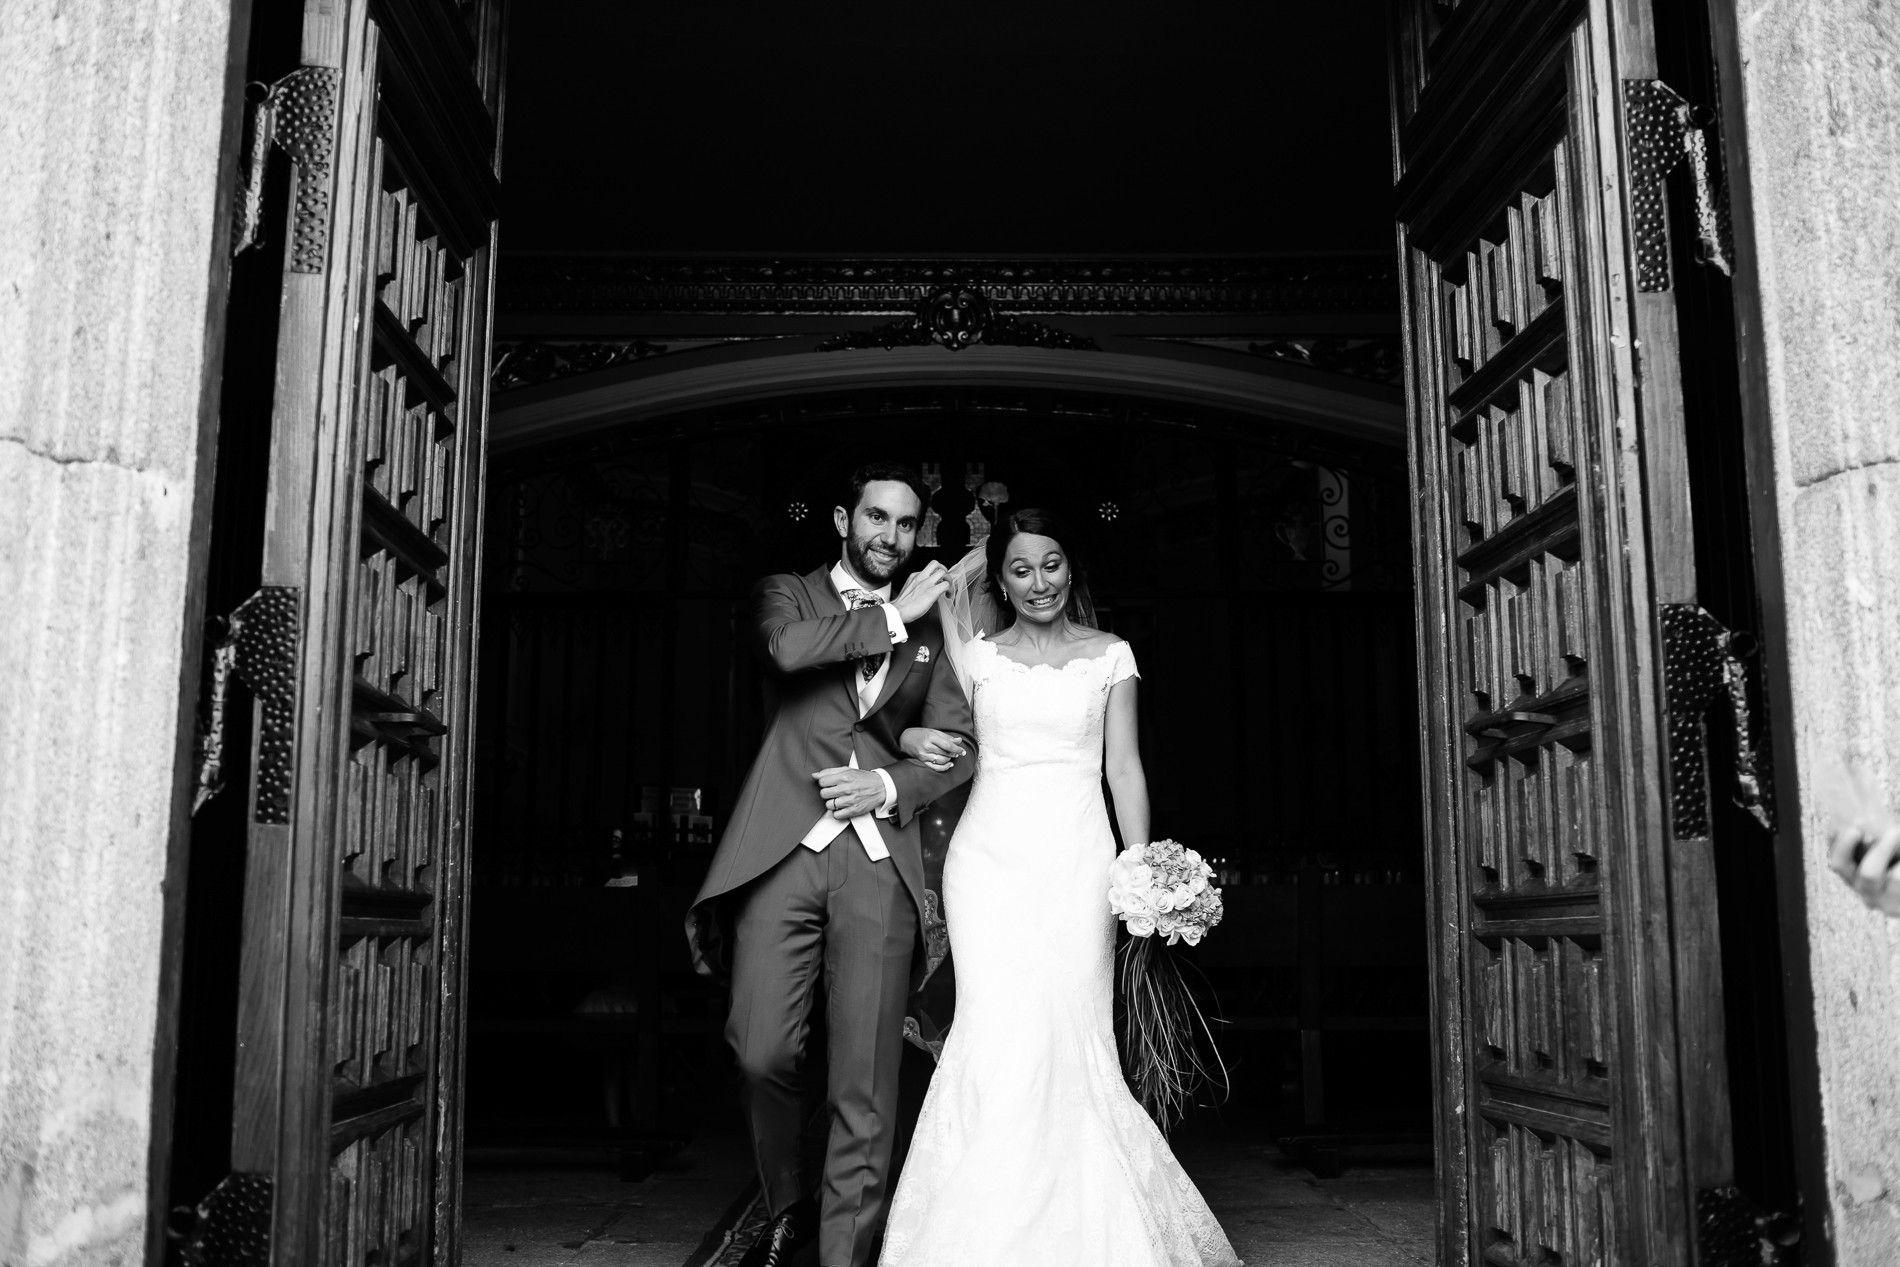 fotografo-de-boda-plasencia-24